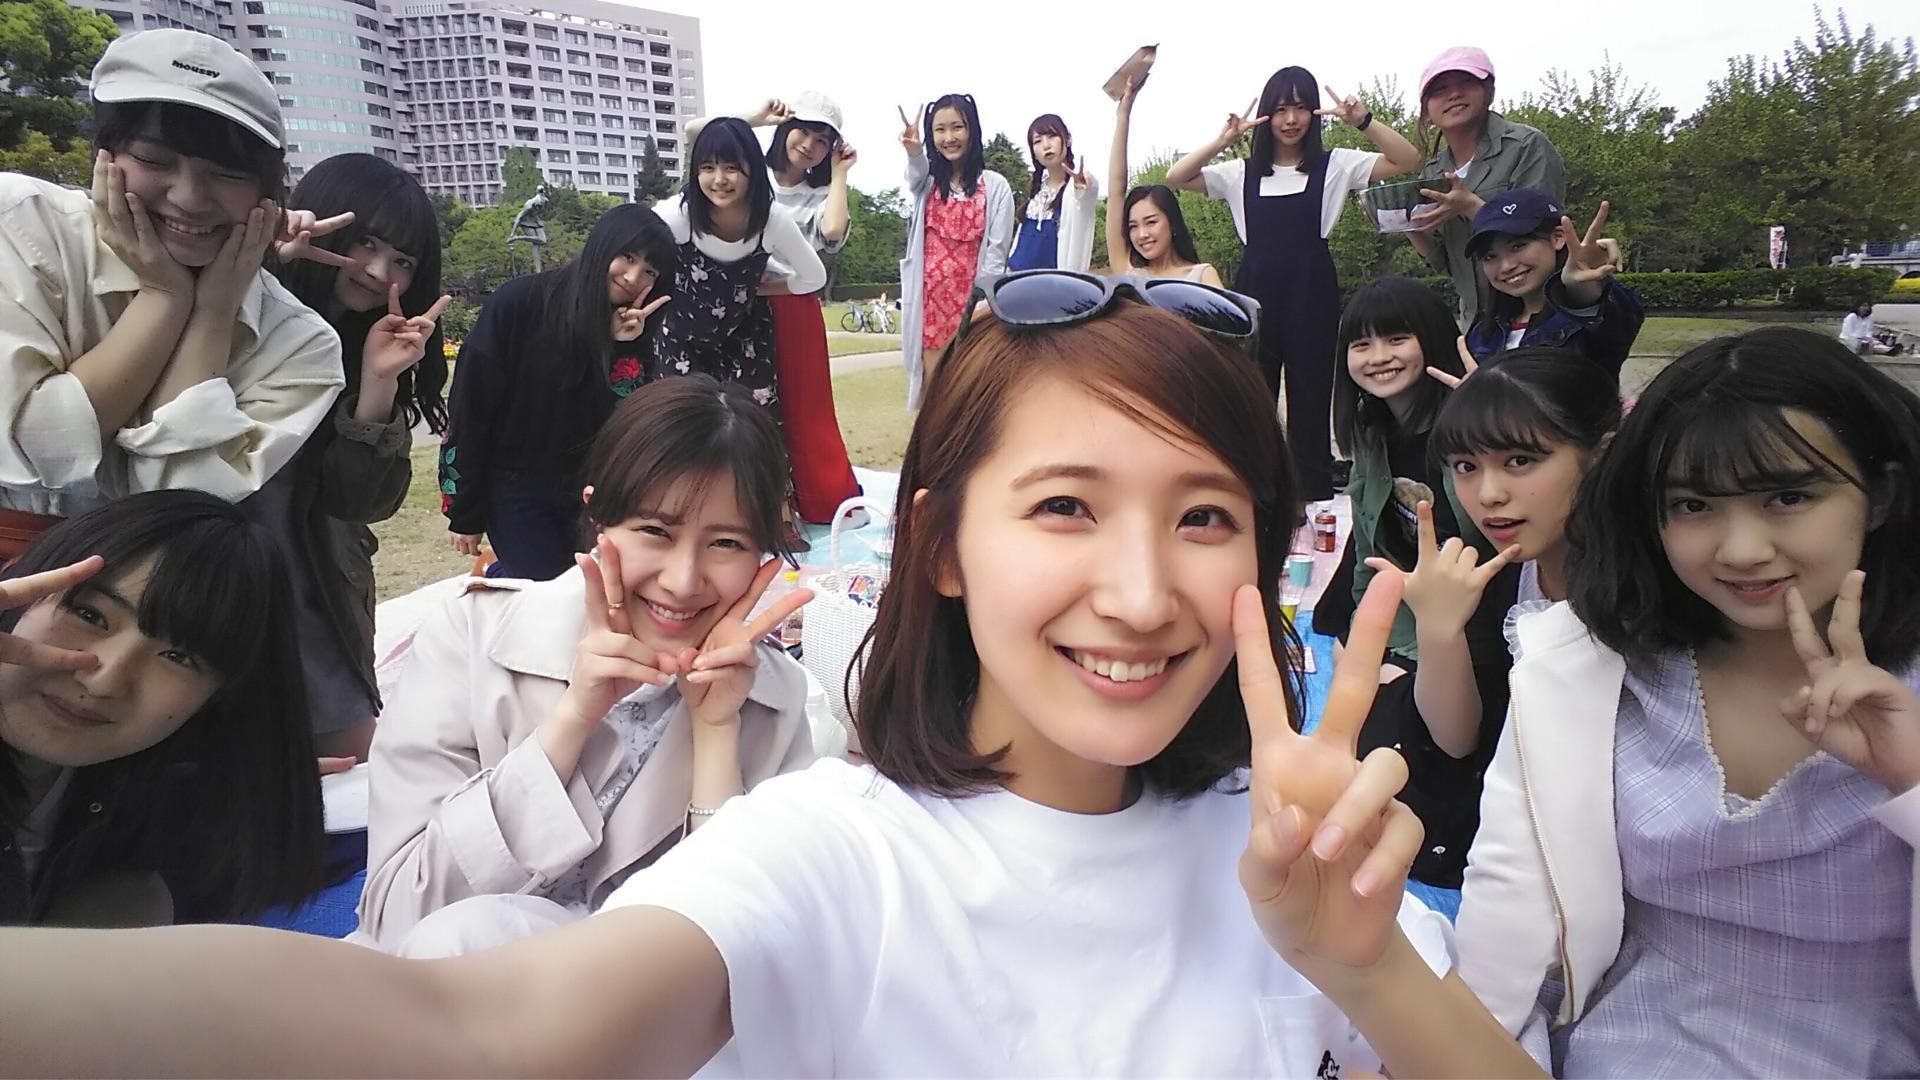 【SKE48】小畑優奈ちゃん応援スレ☆15【ゆなな】©2ch.netYouTube動画>8本 ->画像>291枚